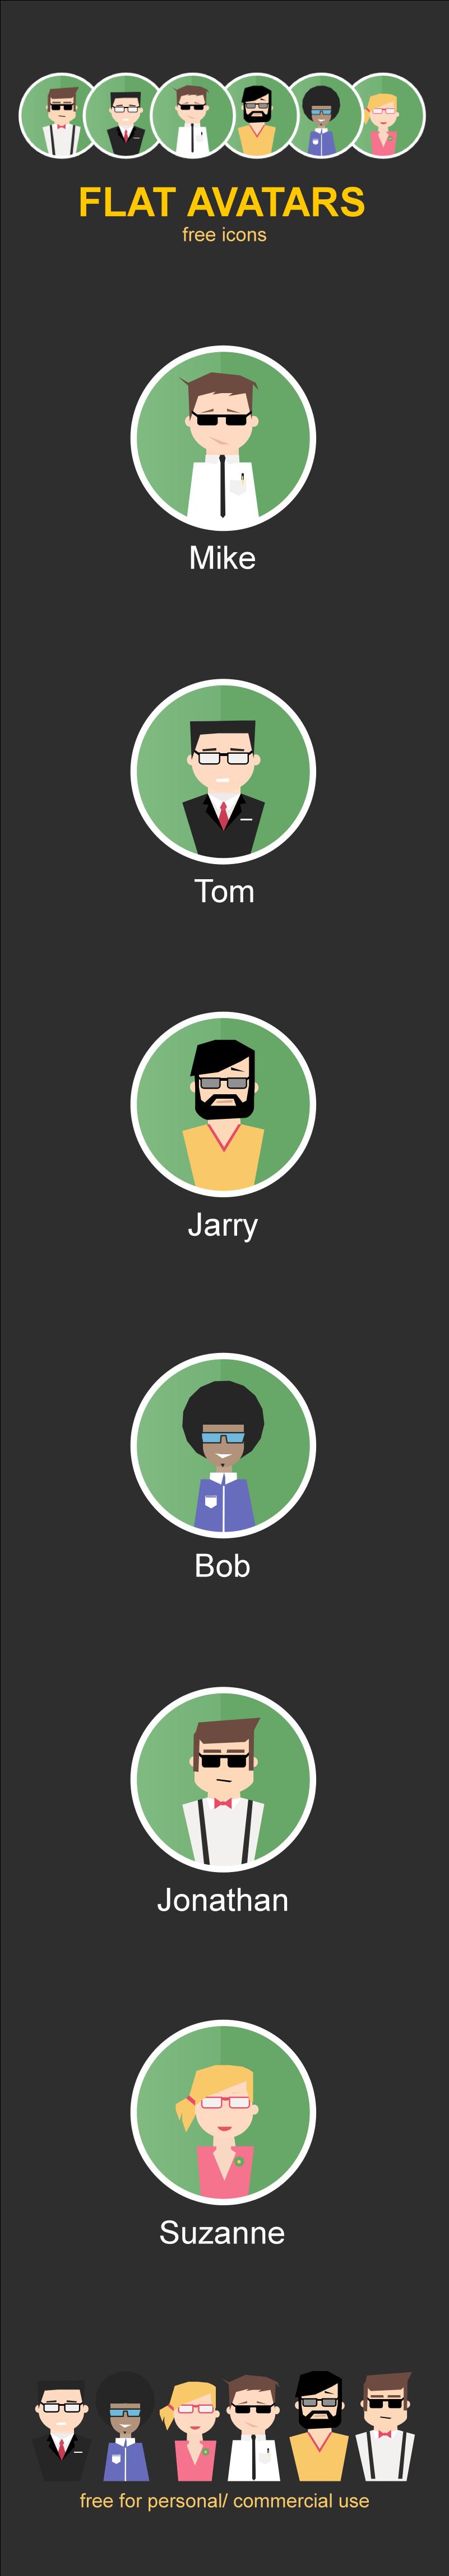 Flat avatars icons